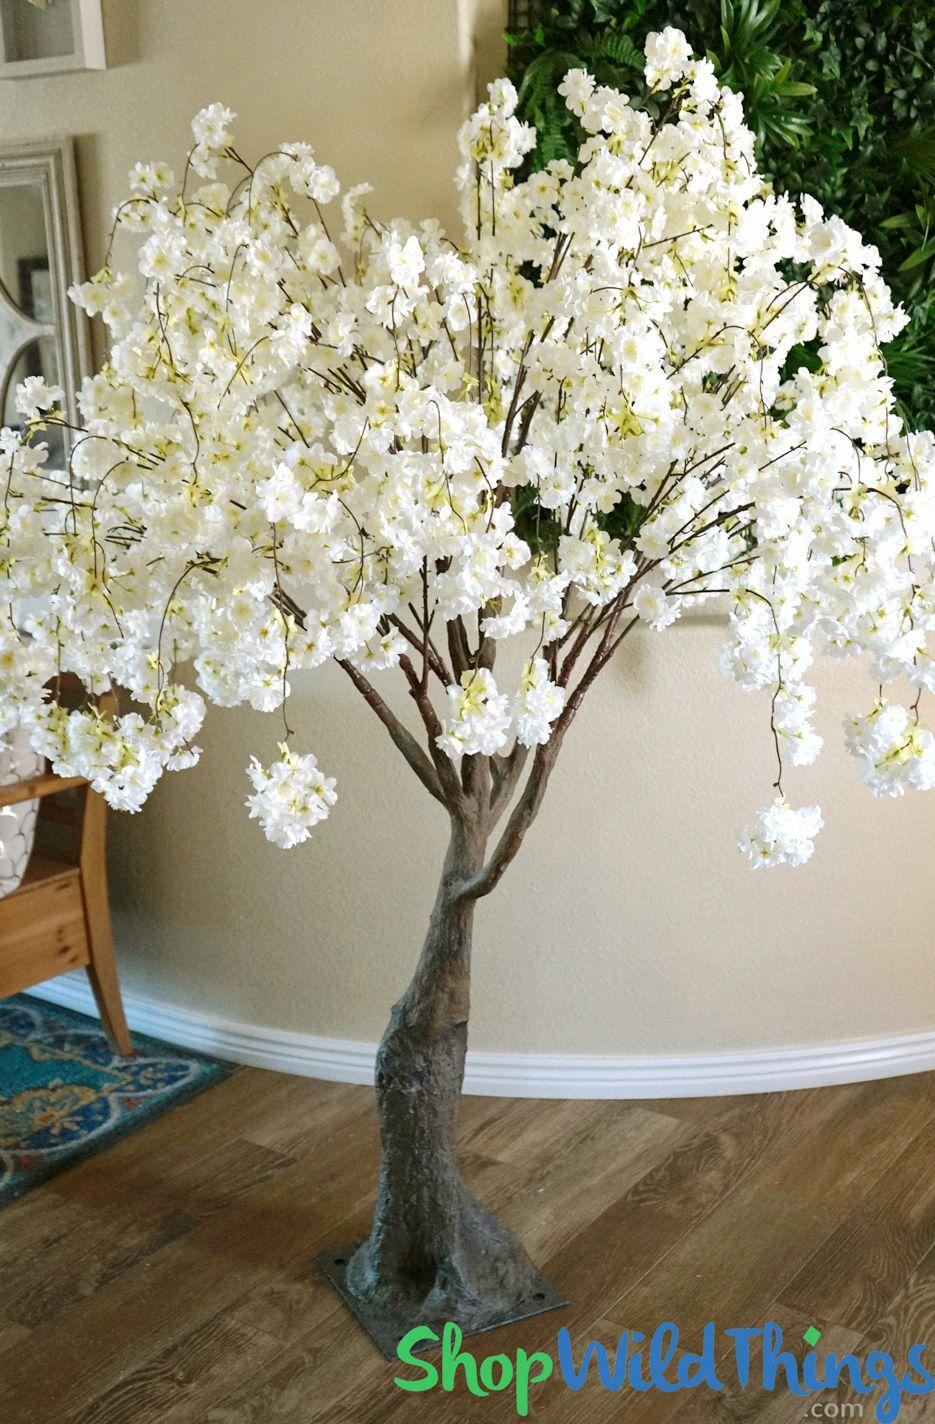 Flowering Cherry Blossom Tree Extra Full 6 Tall Cream Blossom Trees Artificial Cherry Blossom Tree Cherry Blossom Tree